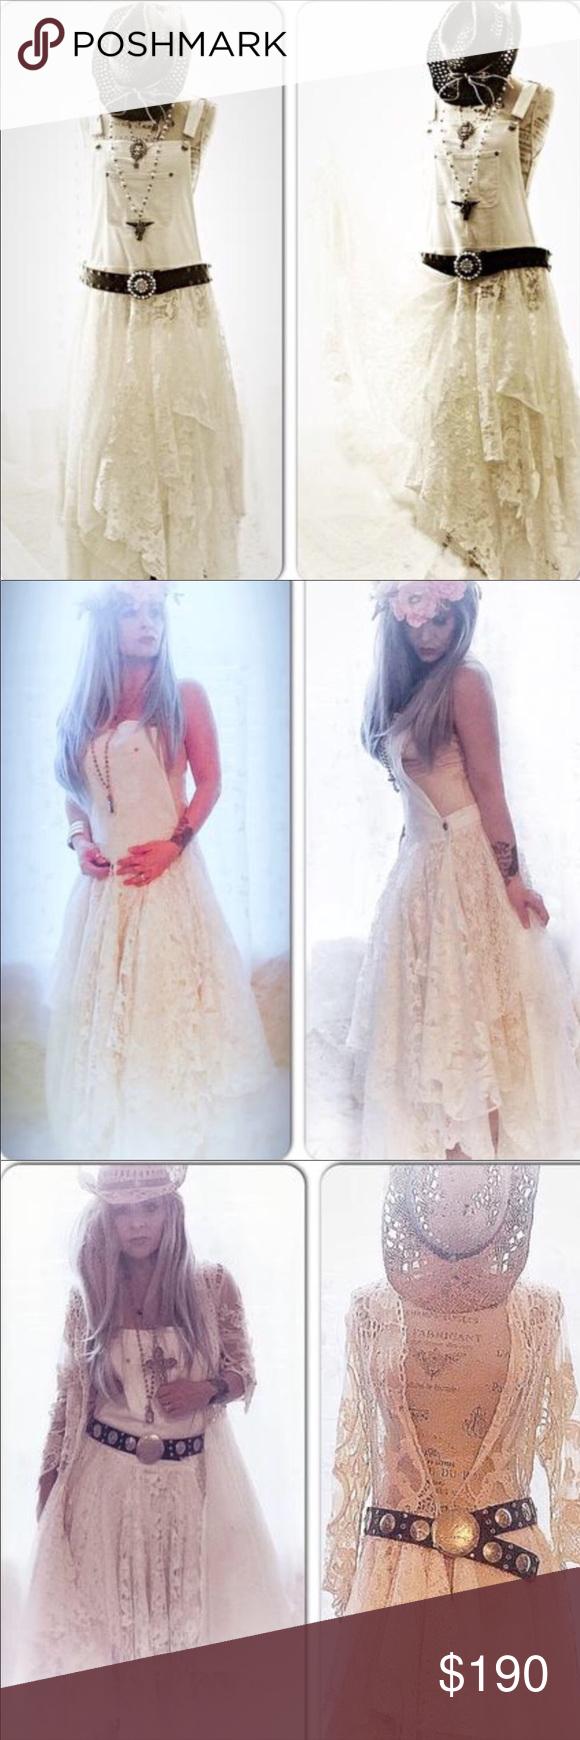 78e5ffa2446 NEW Shabby Boho Chic Overalls Lace Maxi Dress NEW Boho White lace Maxi Dress